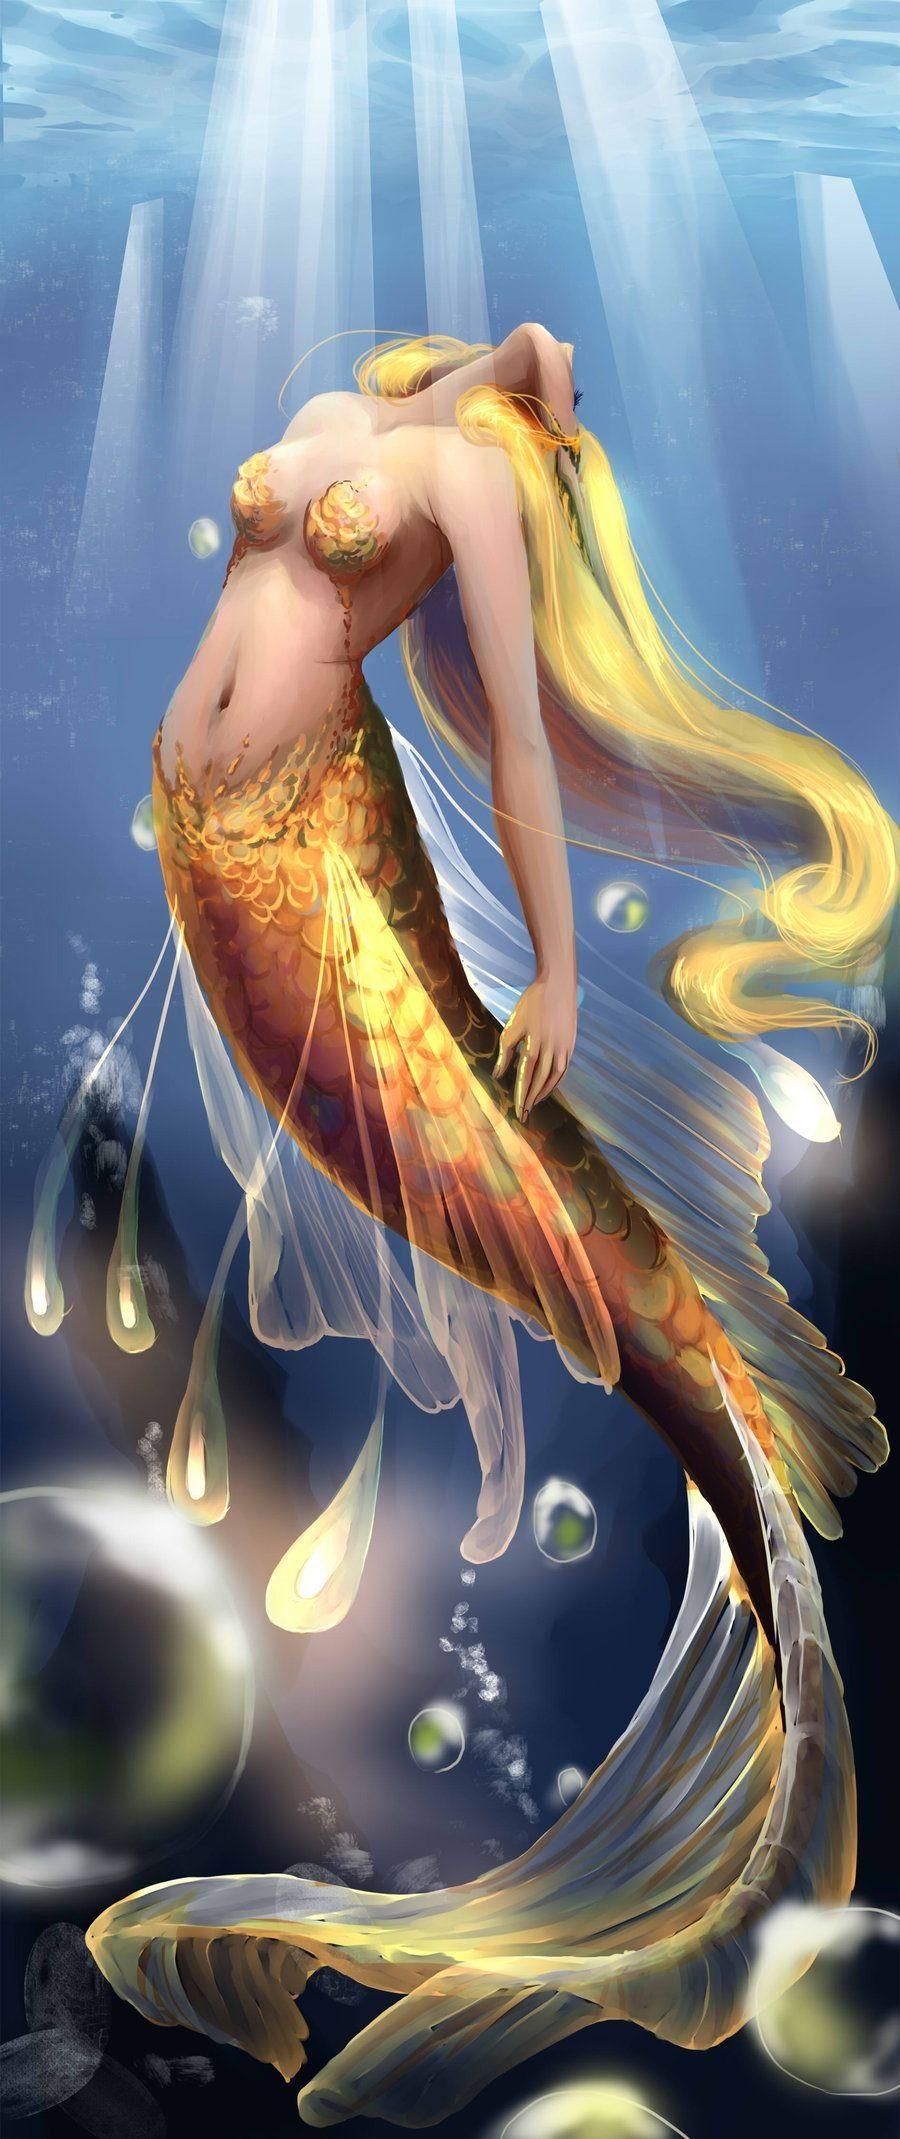 1000 Images About Mermaids On Pinterest Little Mermaid Ariel